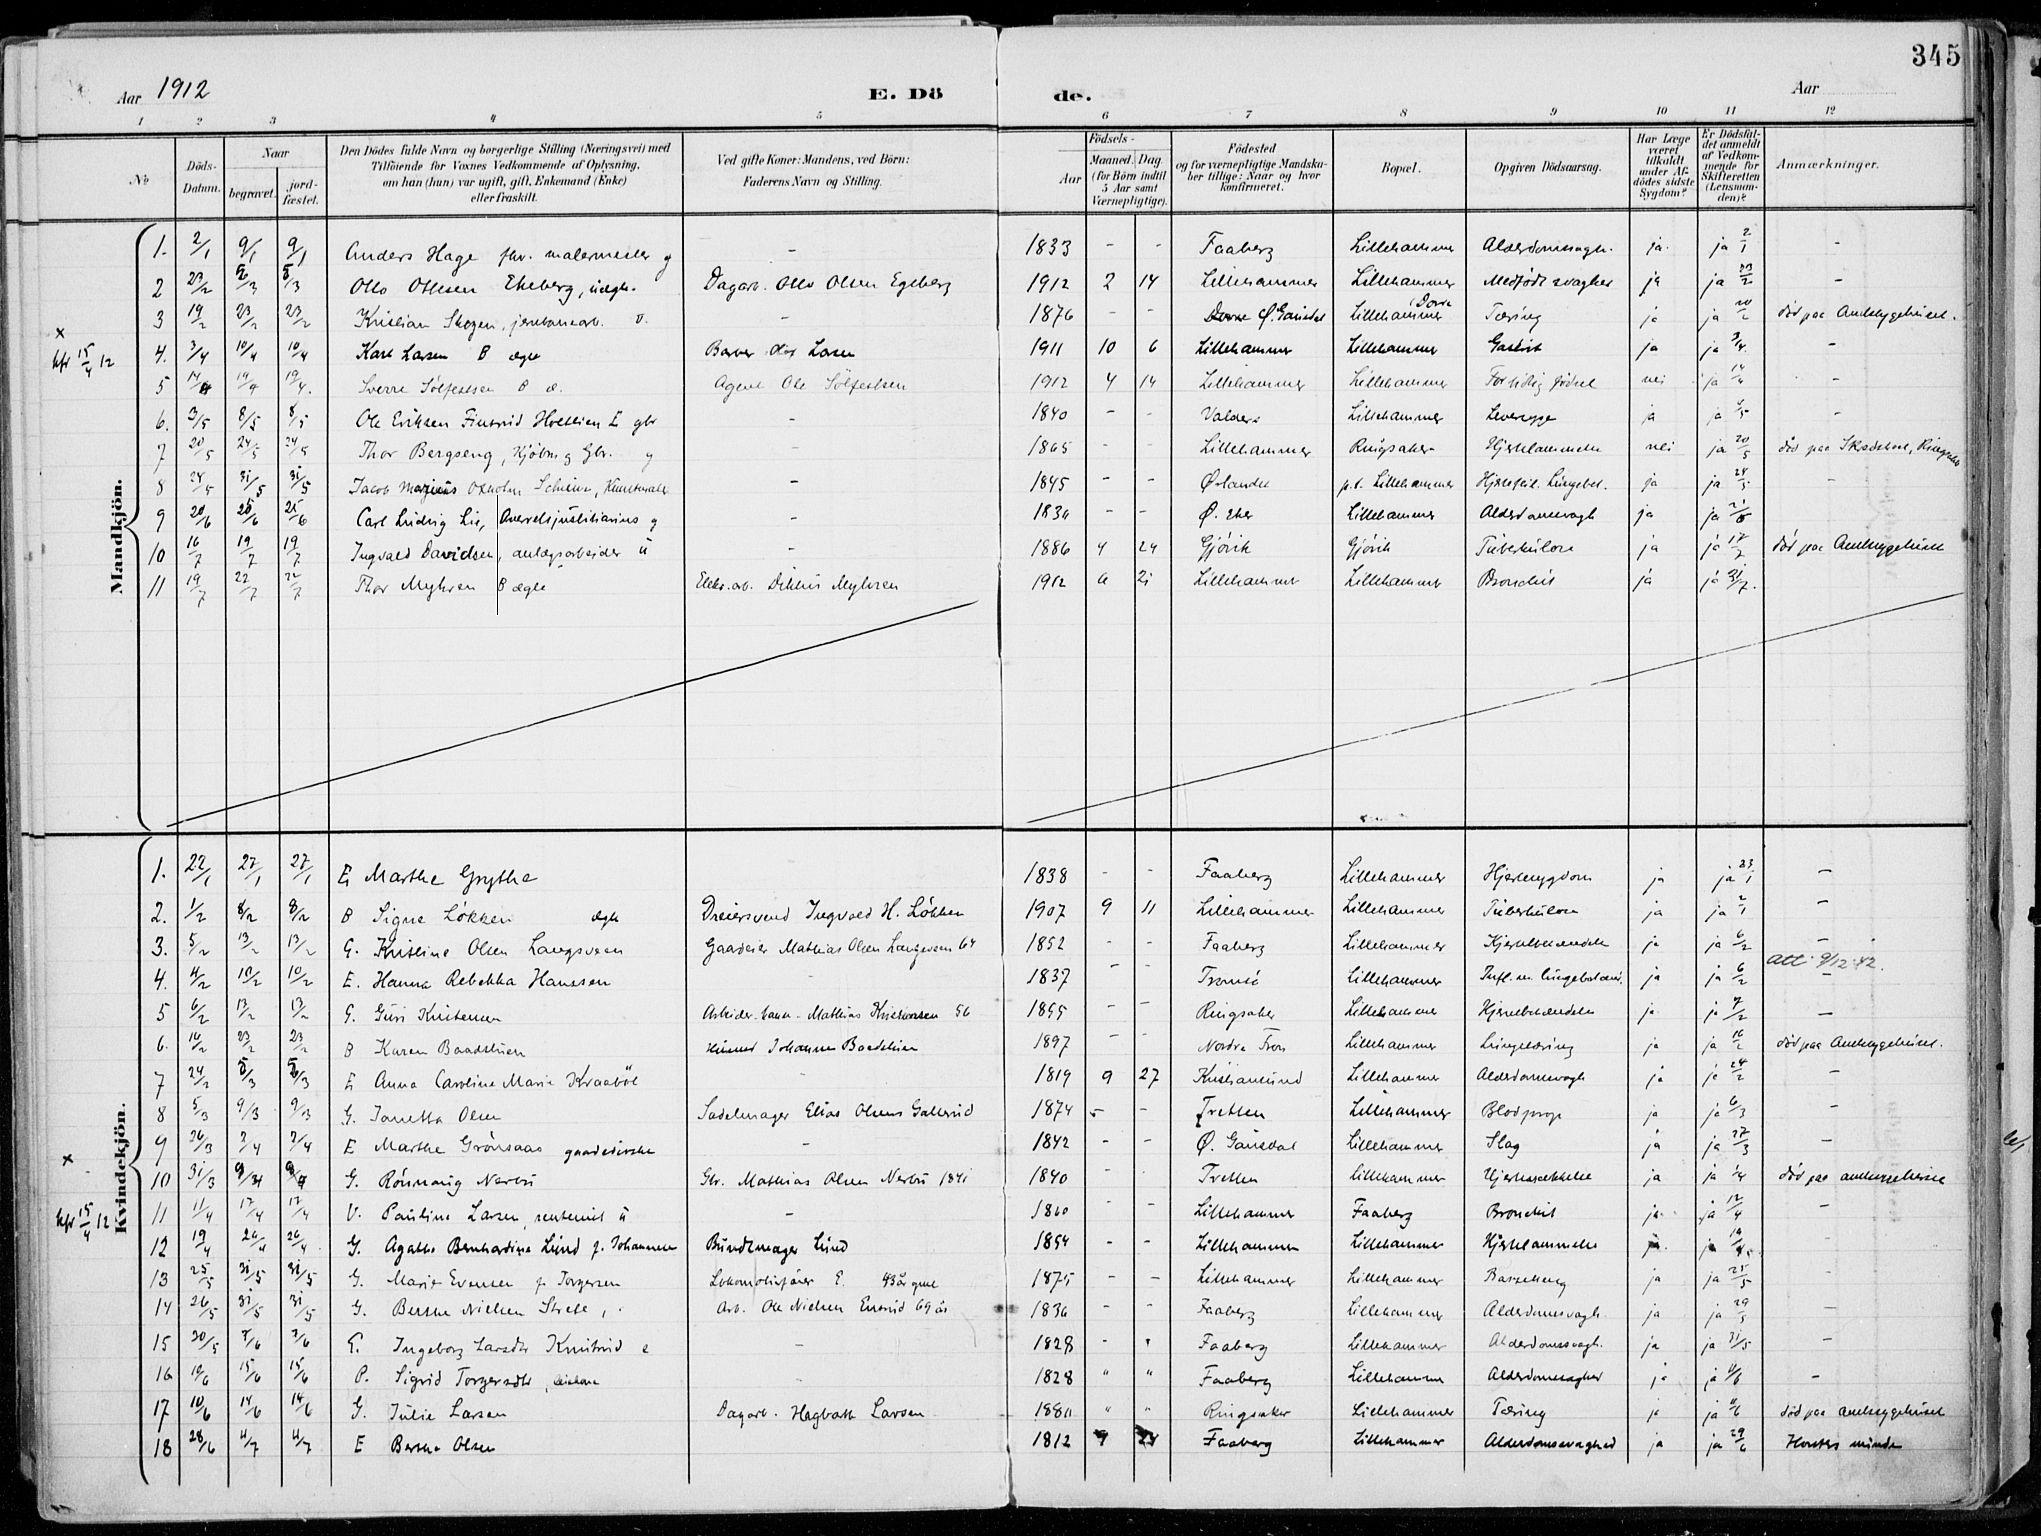 SAH, Lillehammer prestekontor, Ministerialbok nr. 1, 1901-1916, s. 345